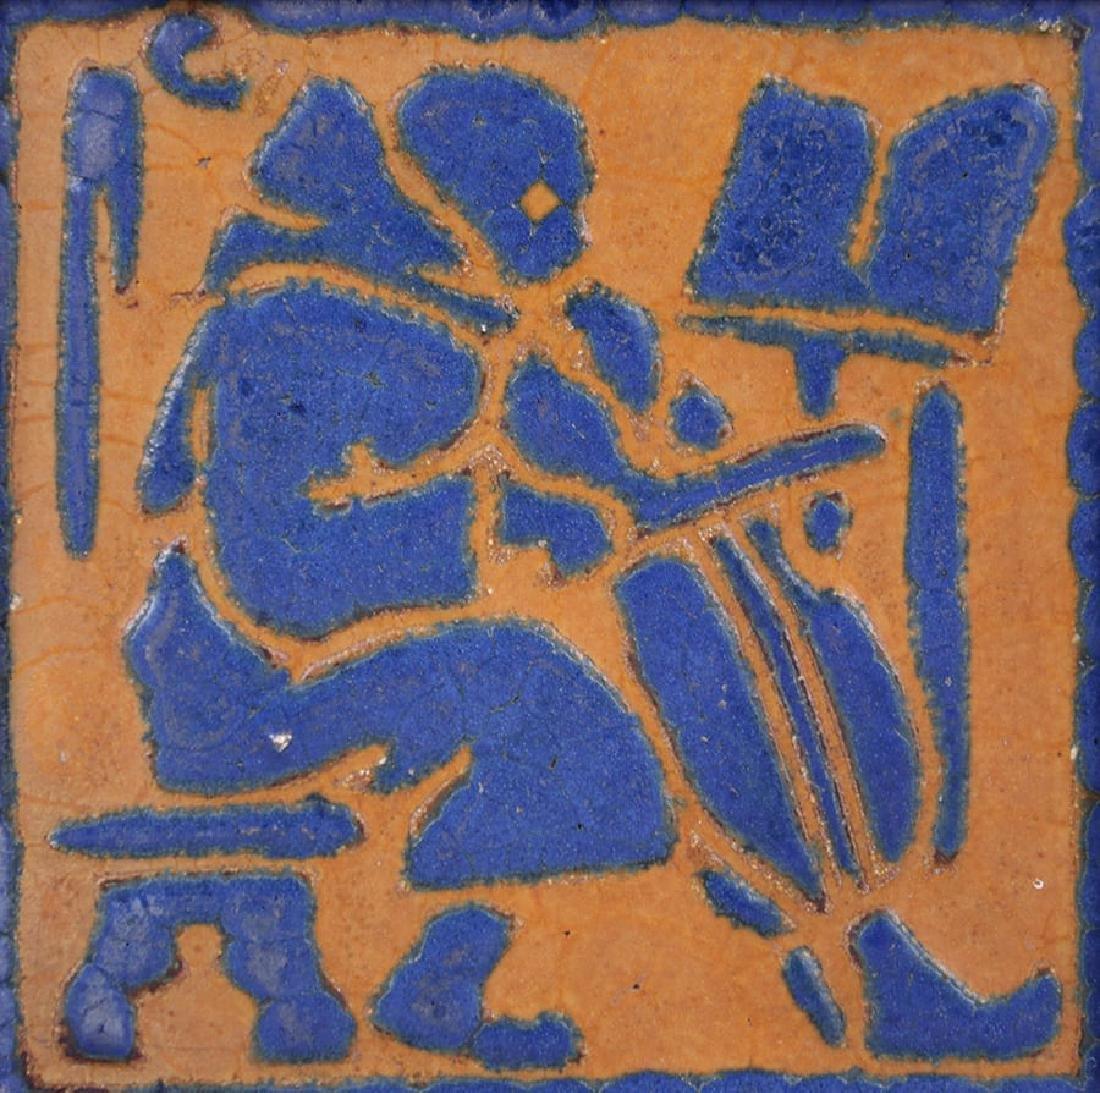 Grueby Faience Matte Blue & Ochre Cello Tile